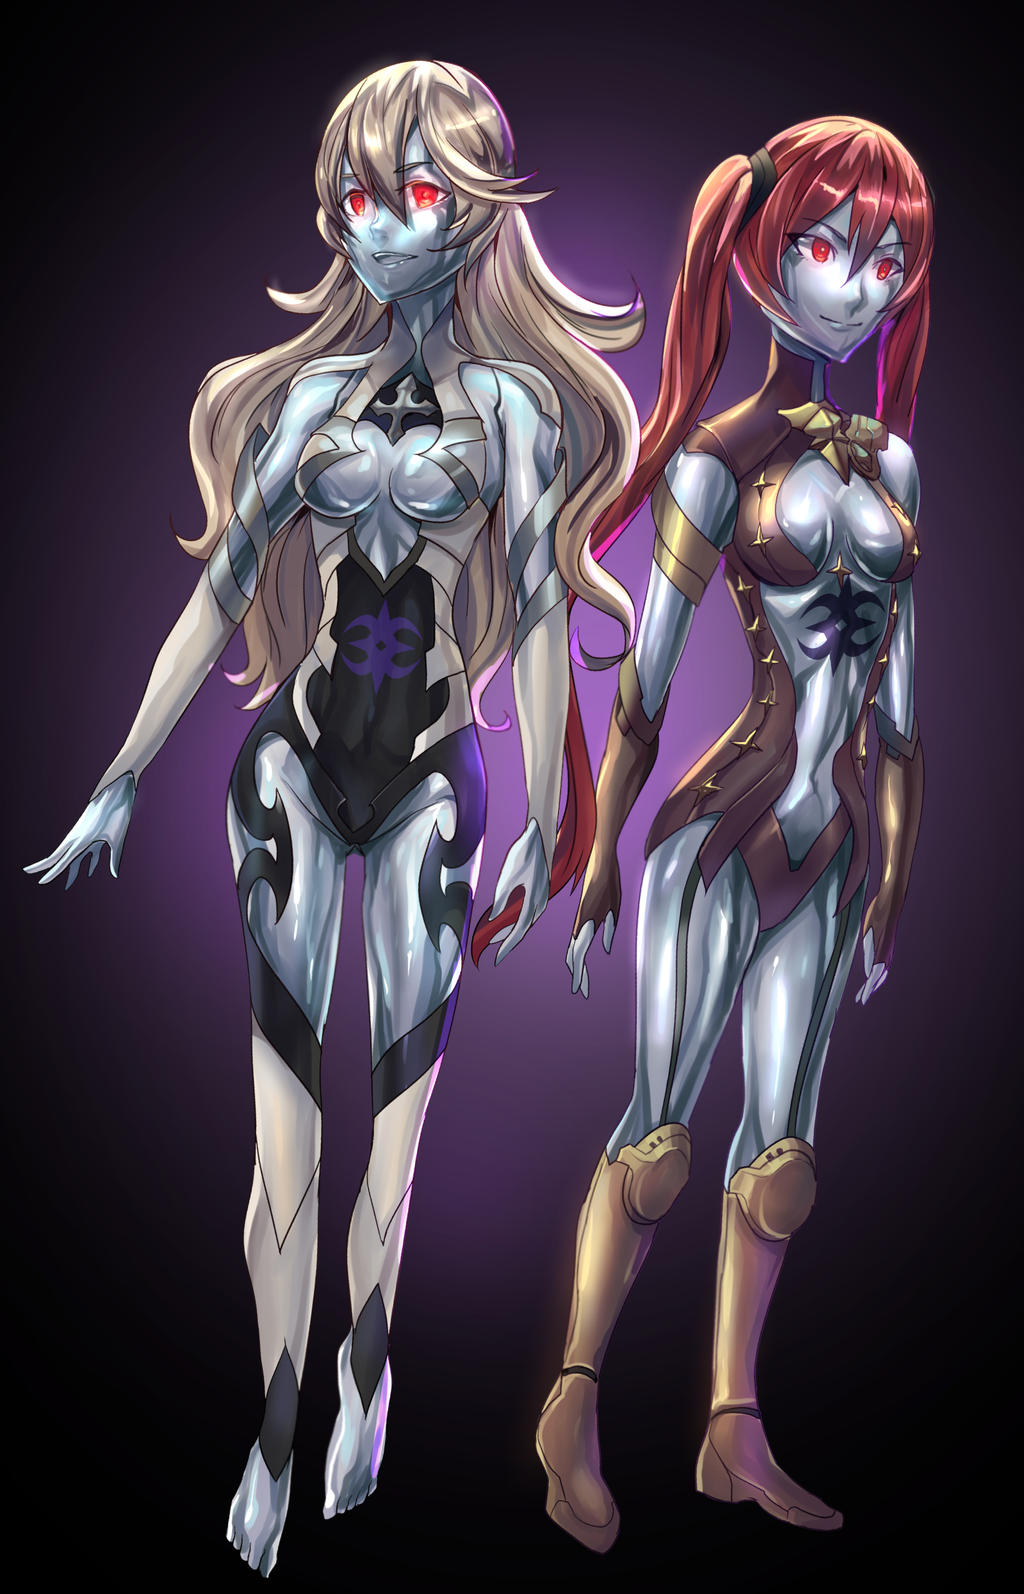 [FE]Golem robot Corrin and Severa